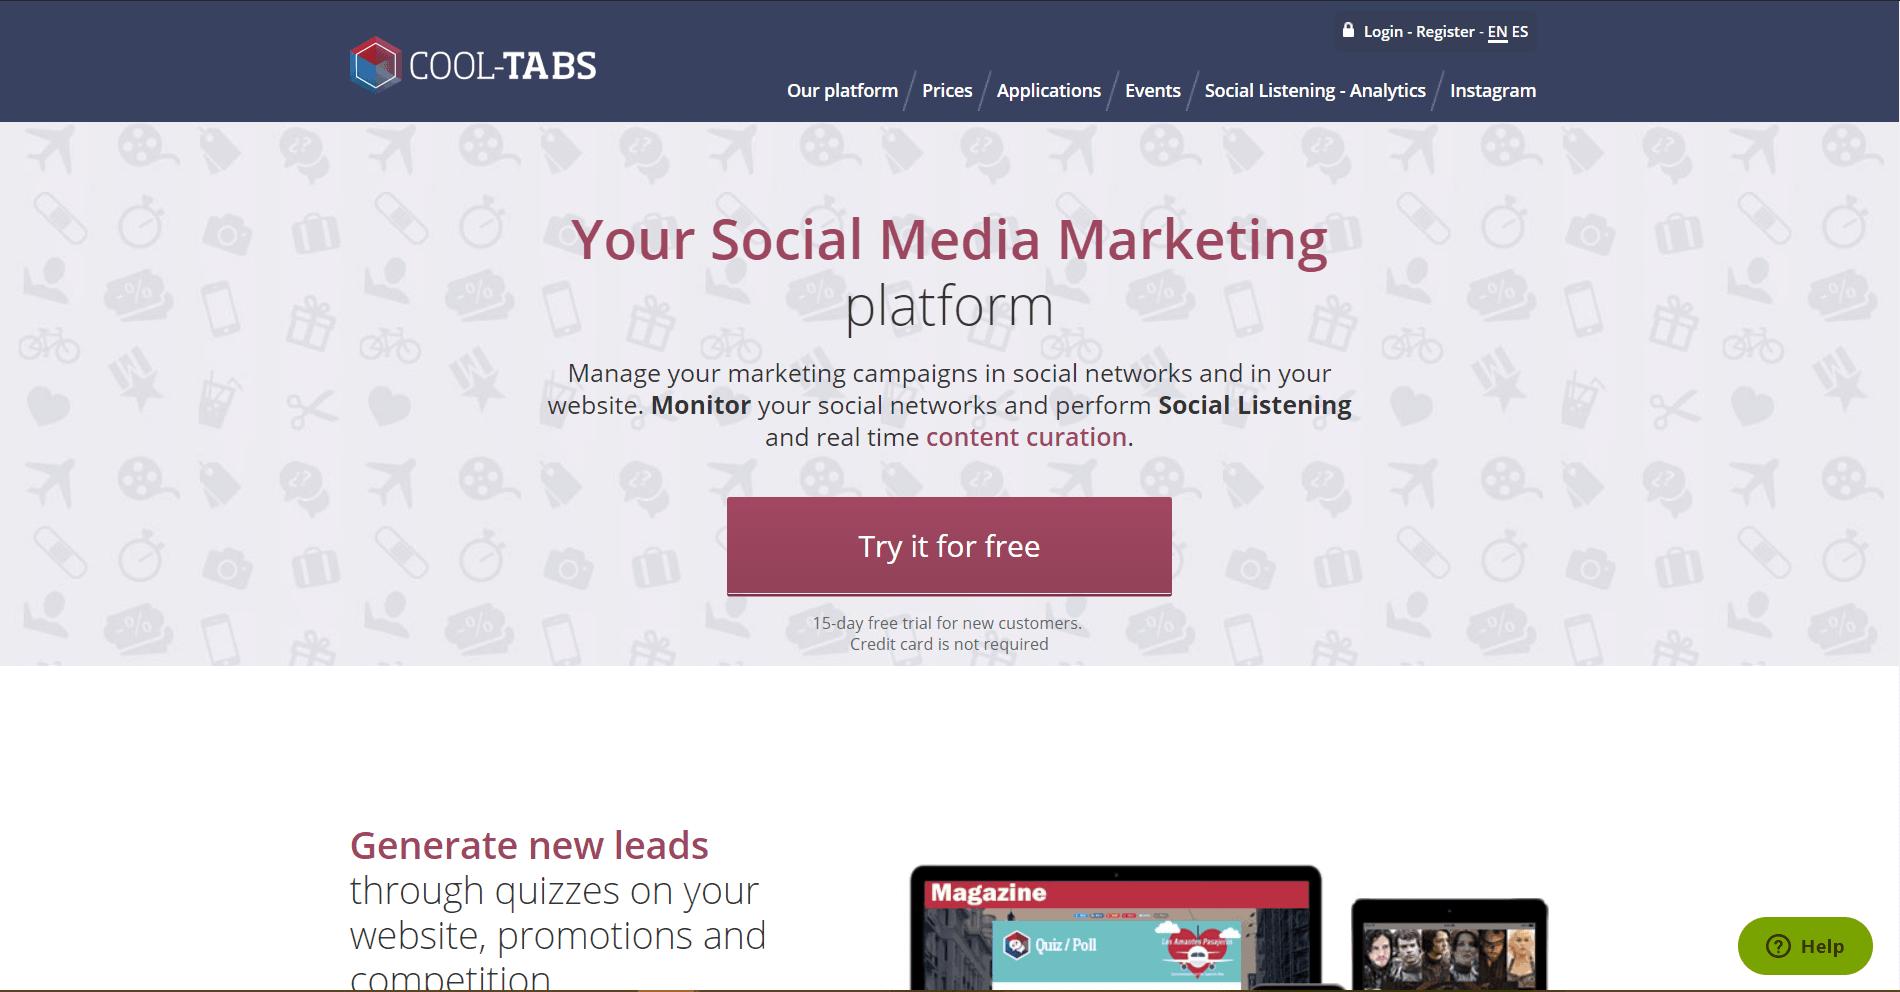 Cool Tabs Social Media Marketing Tool